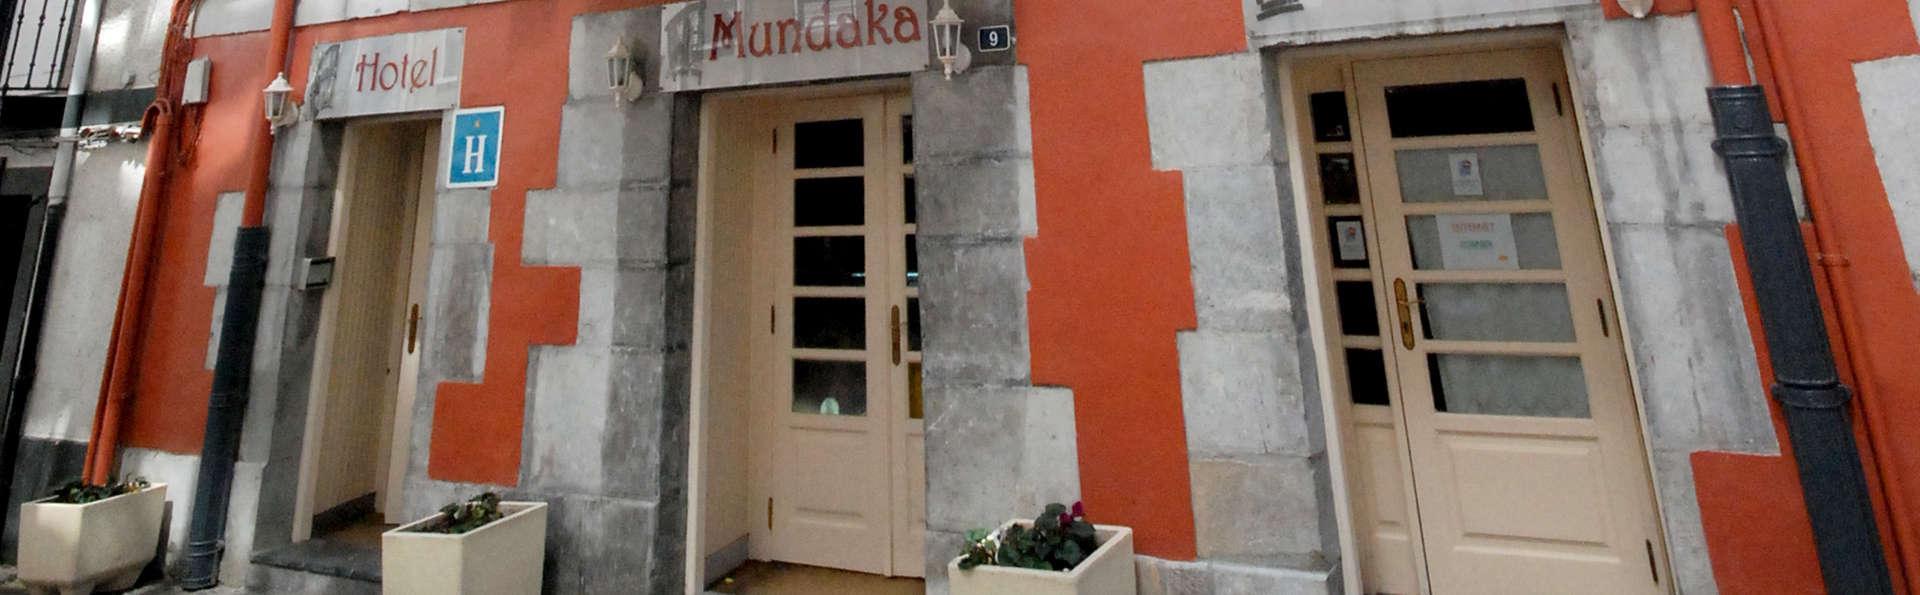 Eco Hotel Mundaka - EDIT_Exterior.jpg